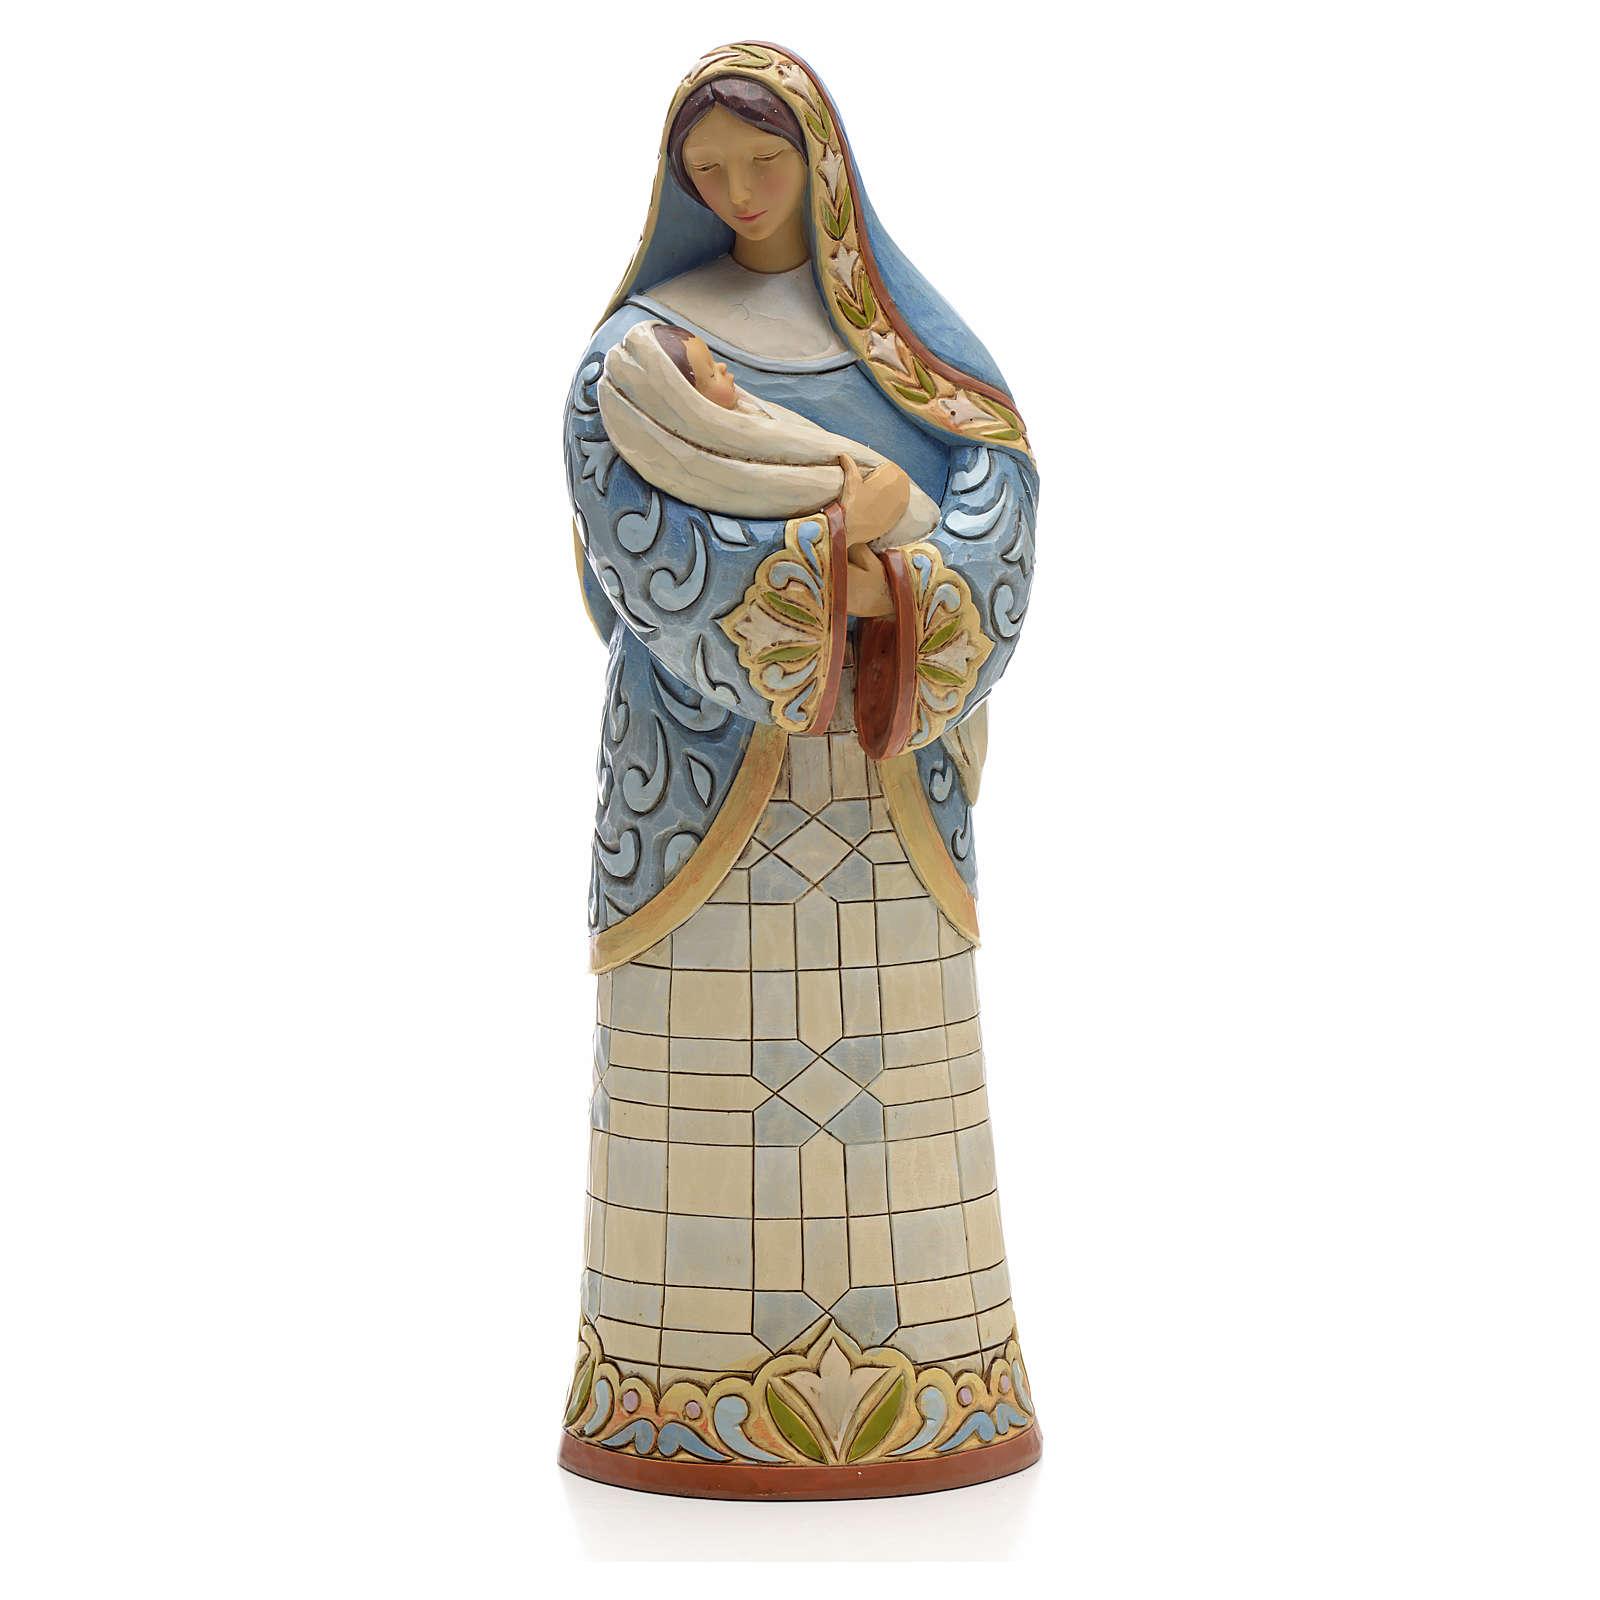 Virgin Mary figurine by Jim Shore 4